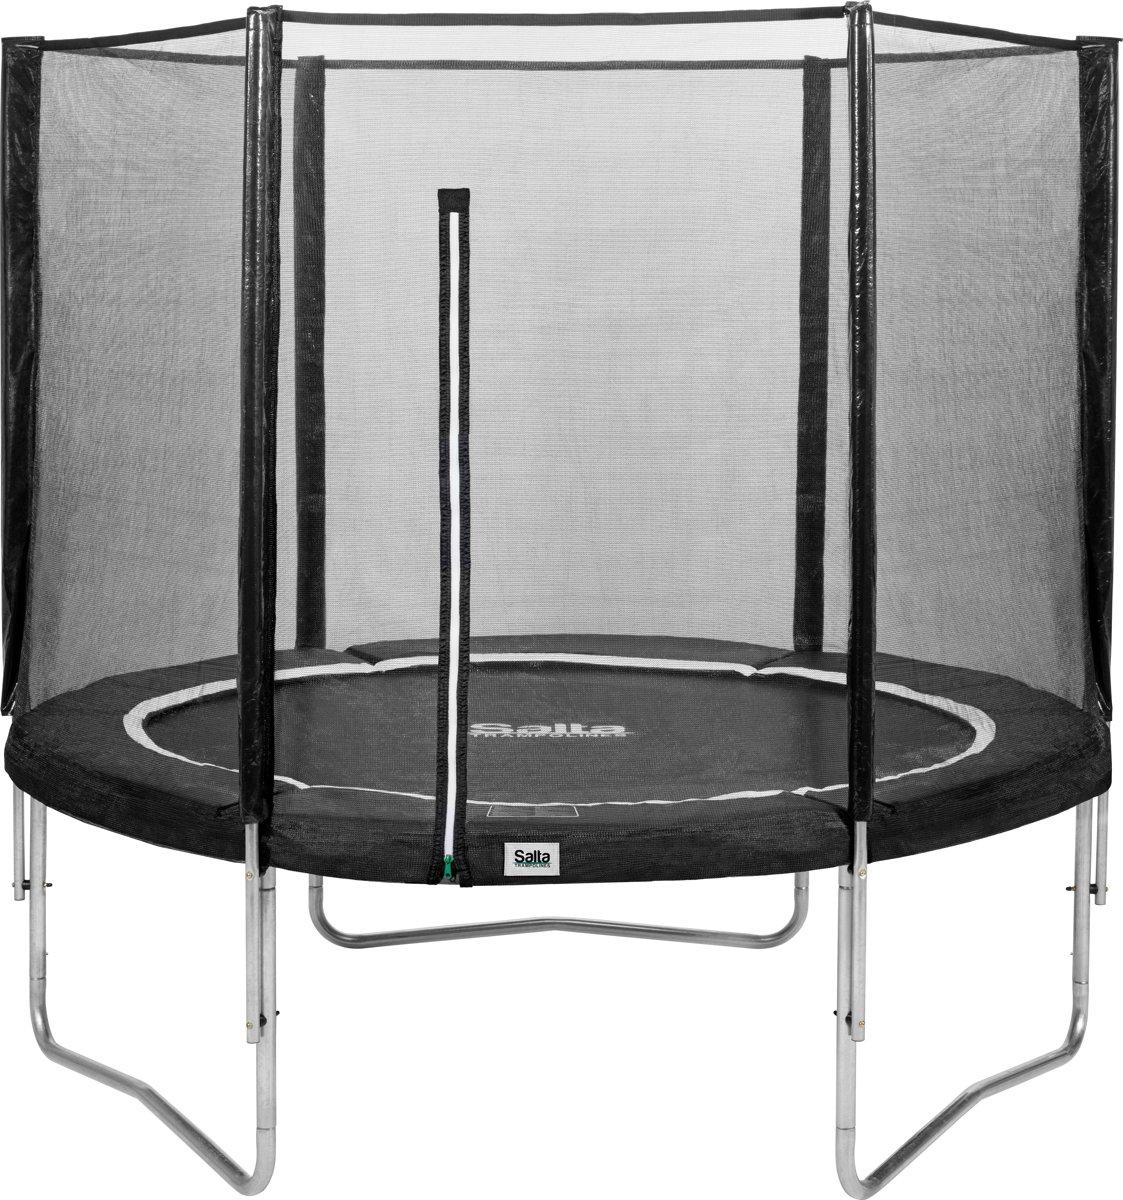 Salta Combo 244 cm Antraciet - Trampoline